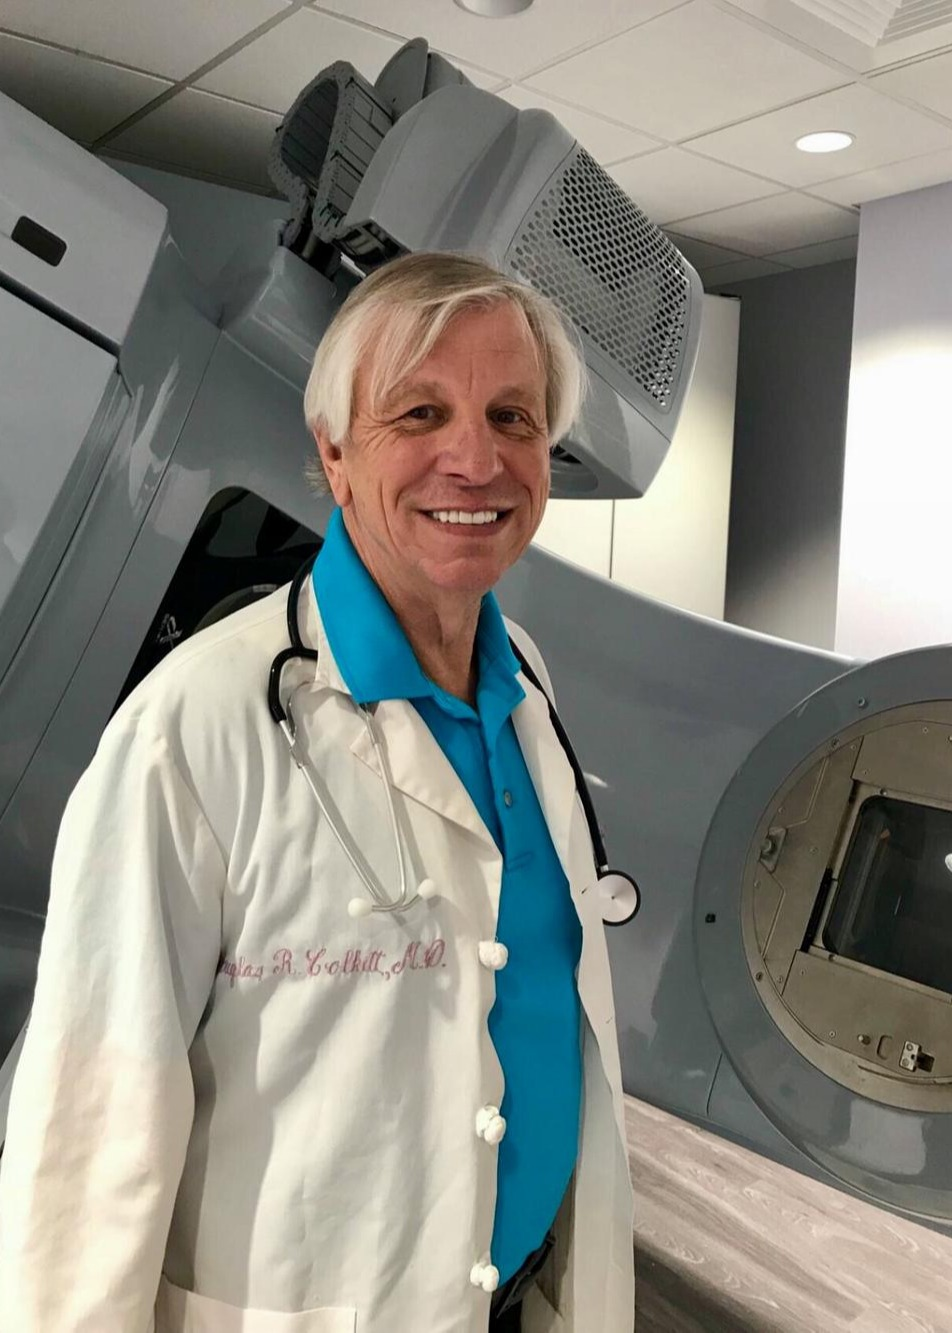 Dr. Douglas Colkitt, MD Hover Photo